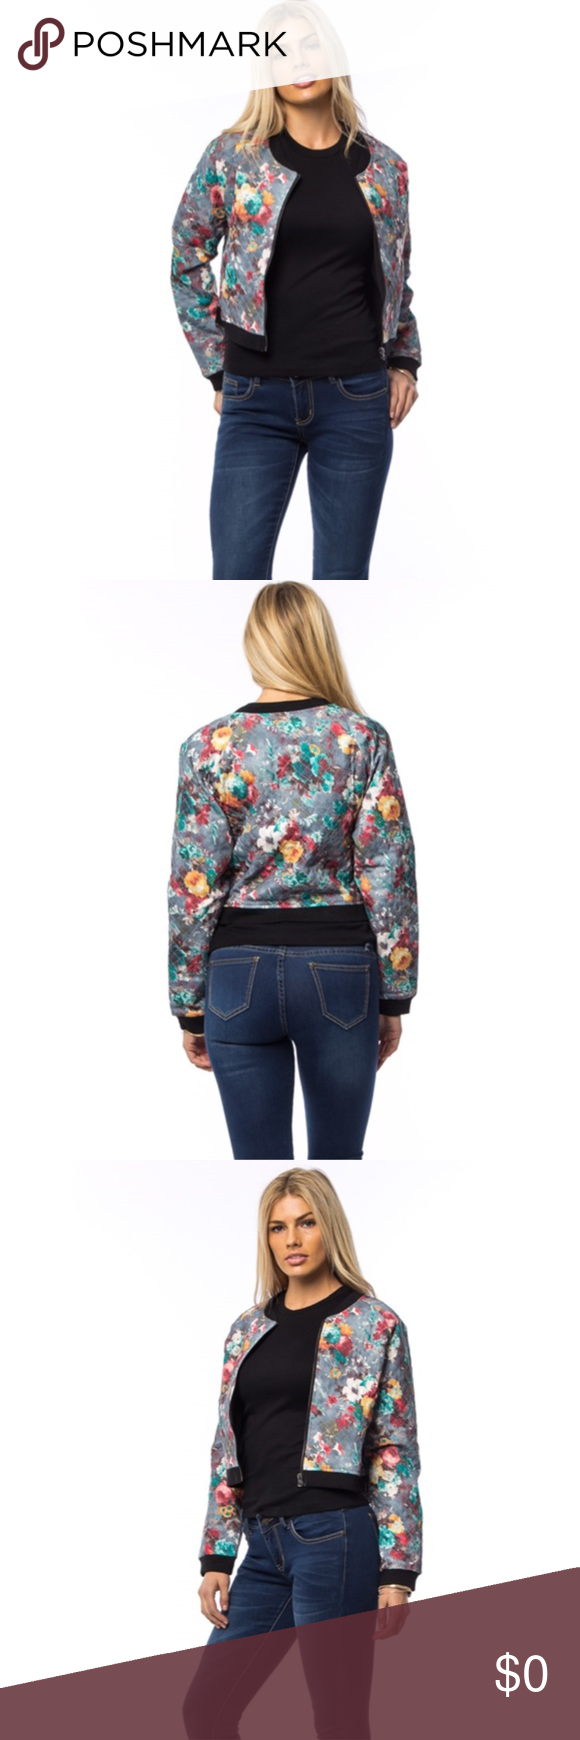 🍂Gray Floral Print Cropped Jacket Gray Floral Print Cropped Jacket. Quilted Jacket. Sizes S M L Available. Jackets & Coats